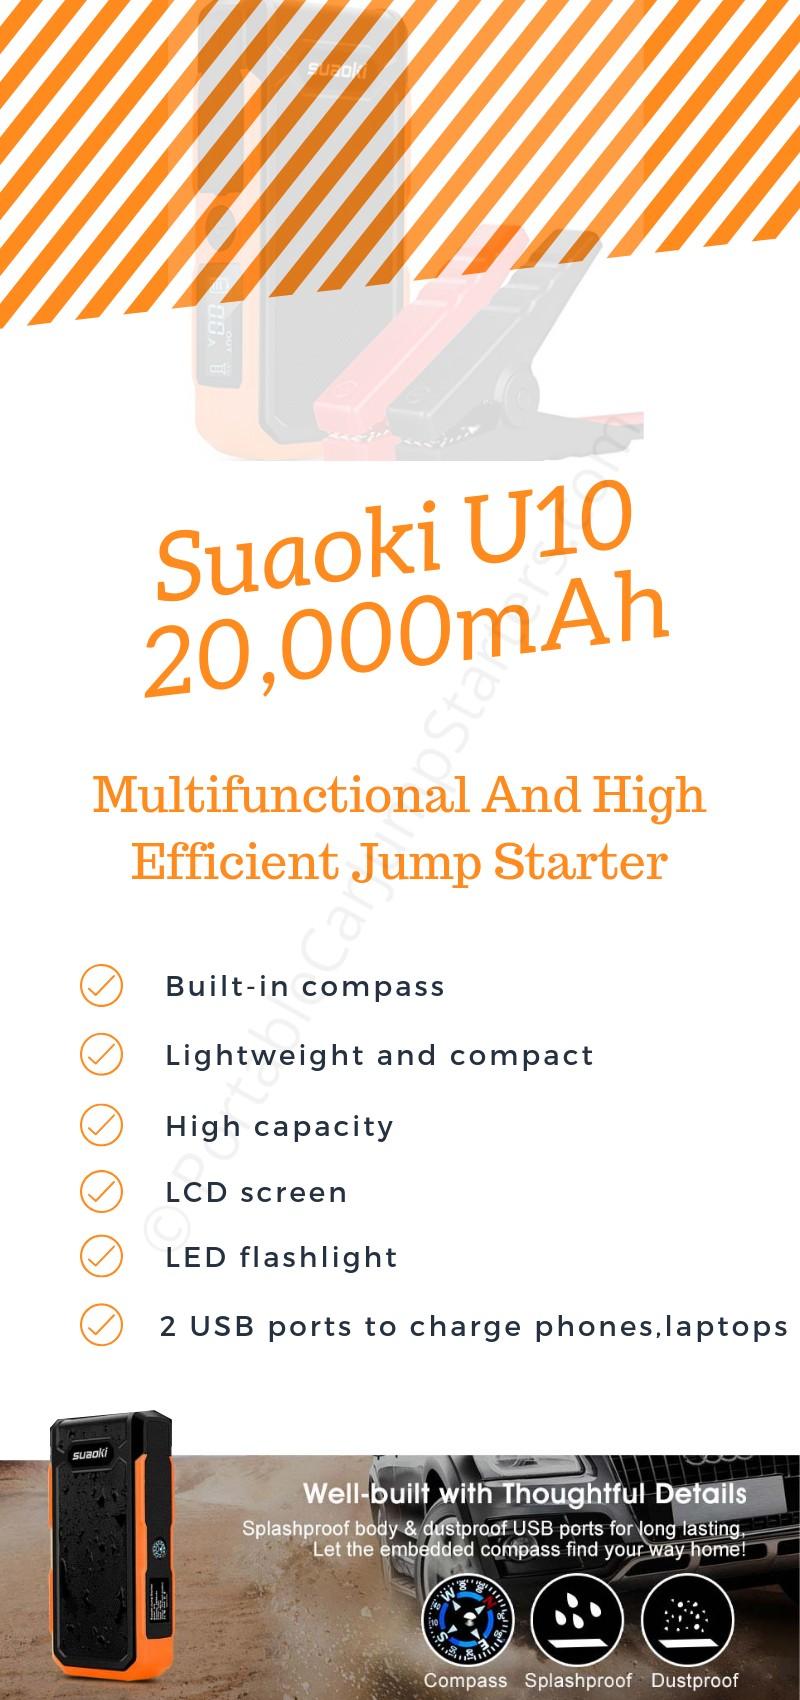 Suaoki U10 Jump Starter Specifications